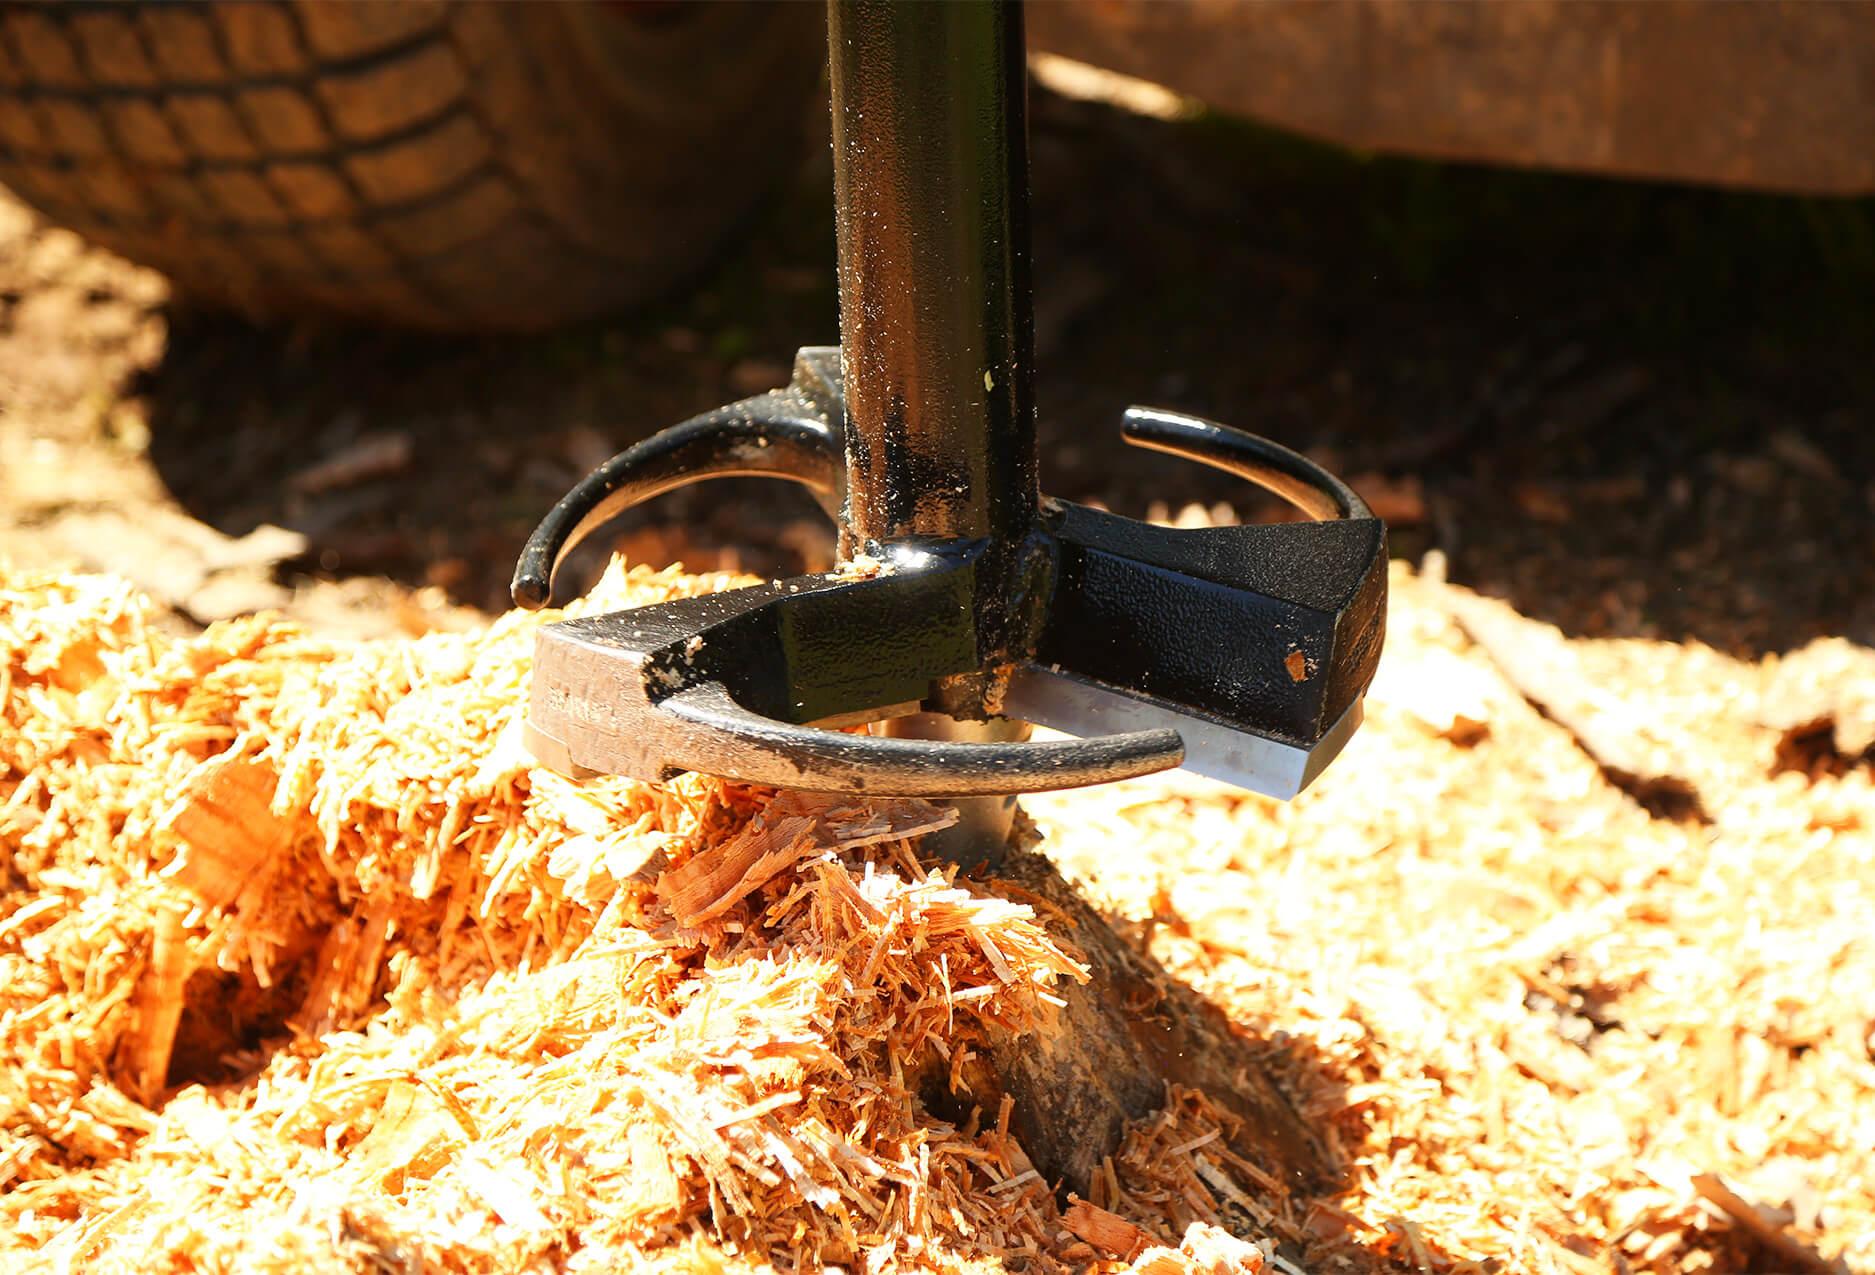 skid steer auger stump planer removing a tree stump.